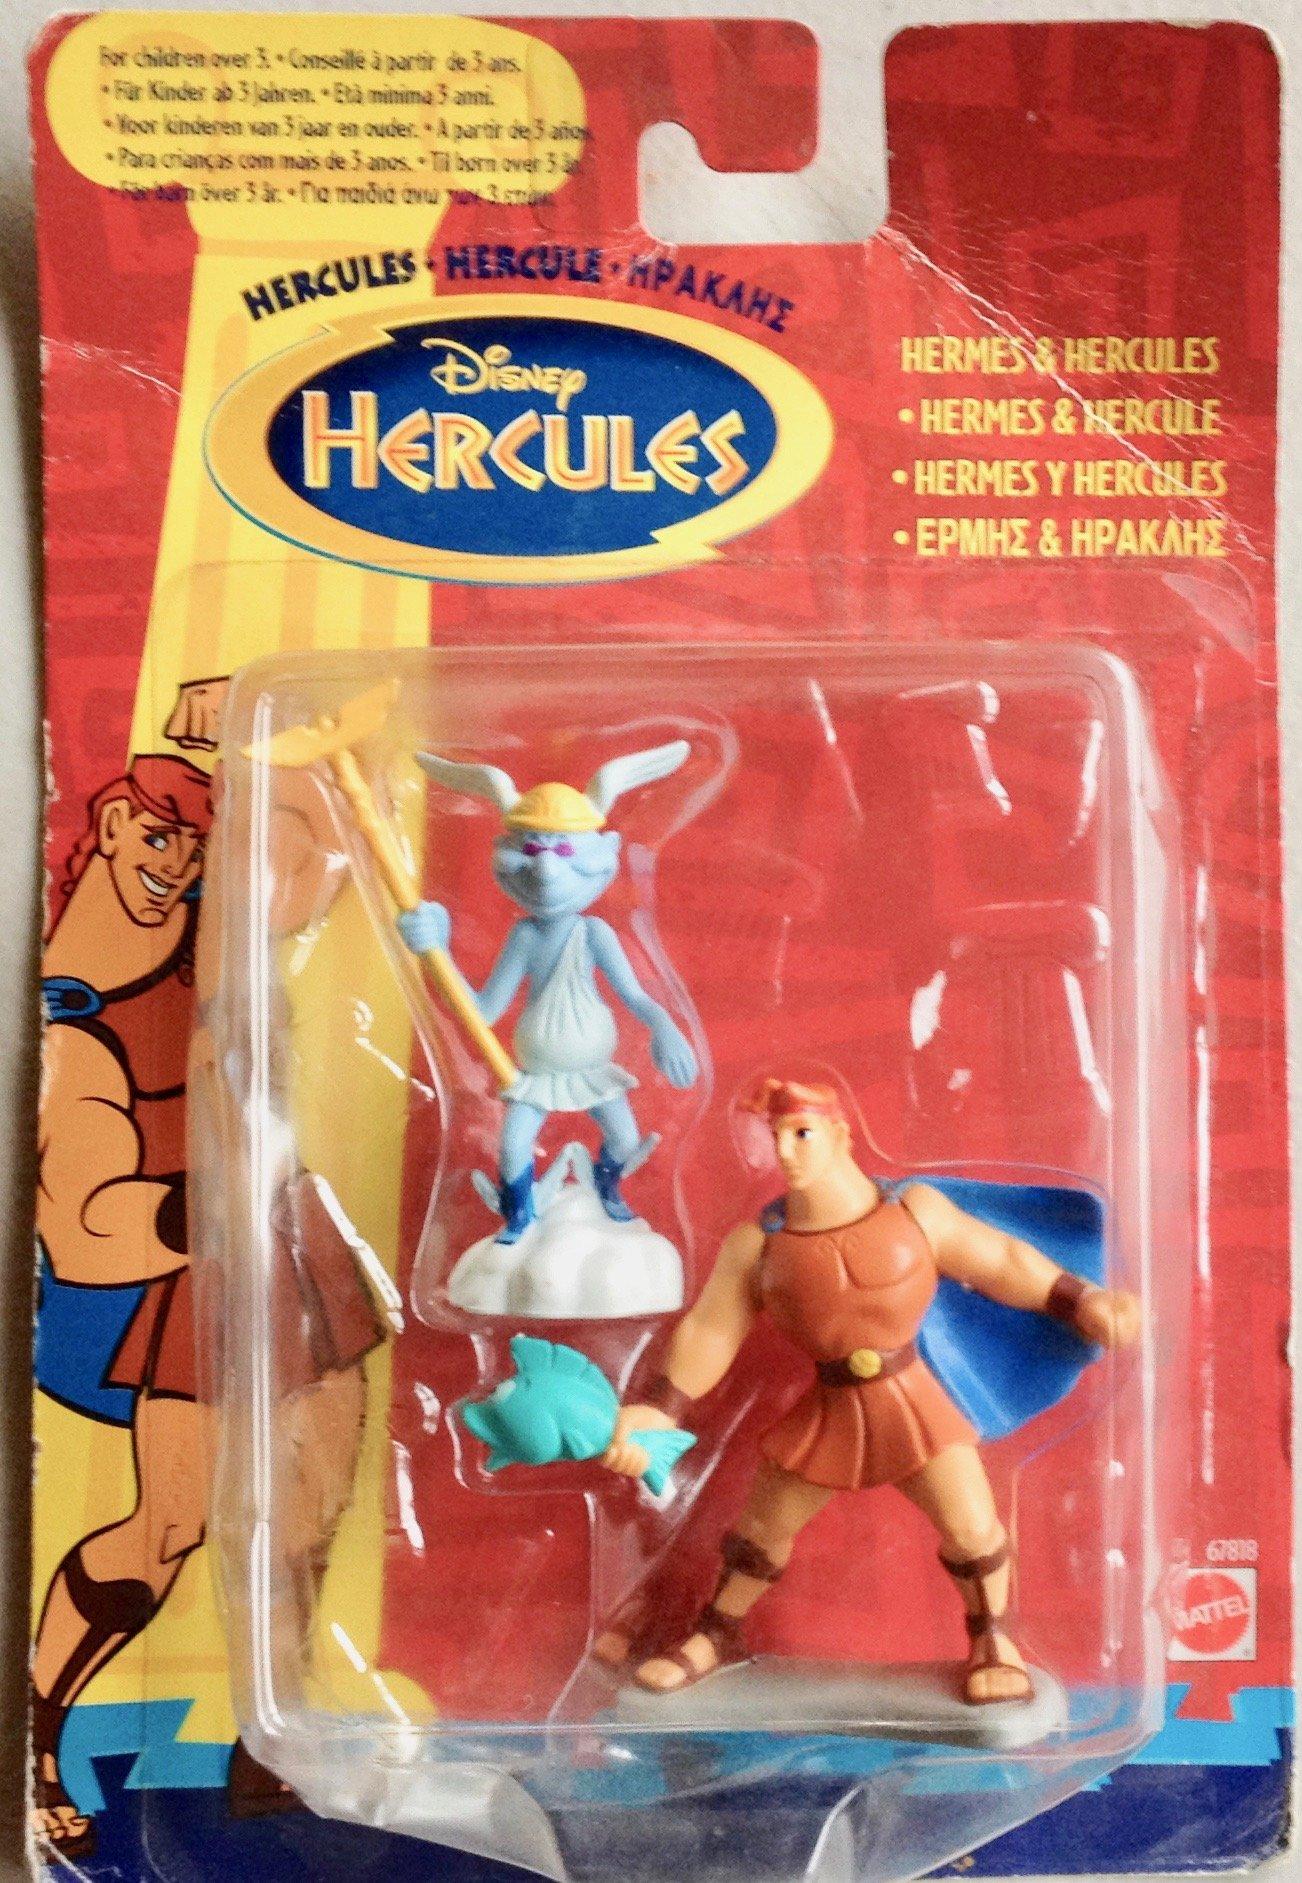 Disney's Hercules Hermes & Hercules set